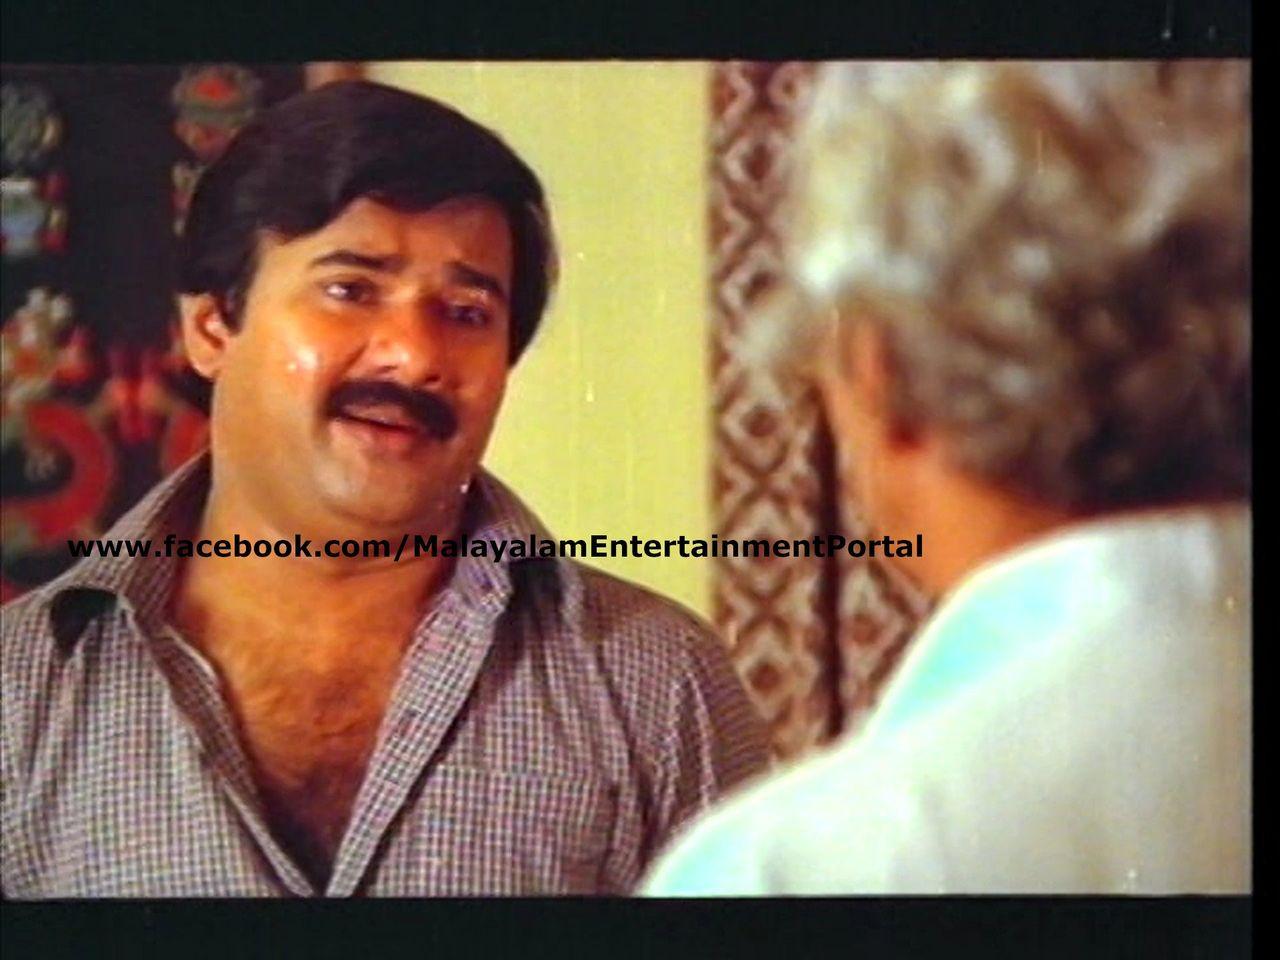 Mukundetta Sumithra Vilikyunnu Saina DVD Screenshots Bscap0008